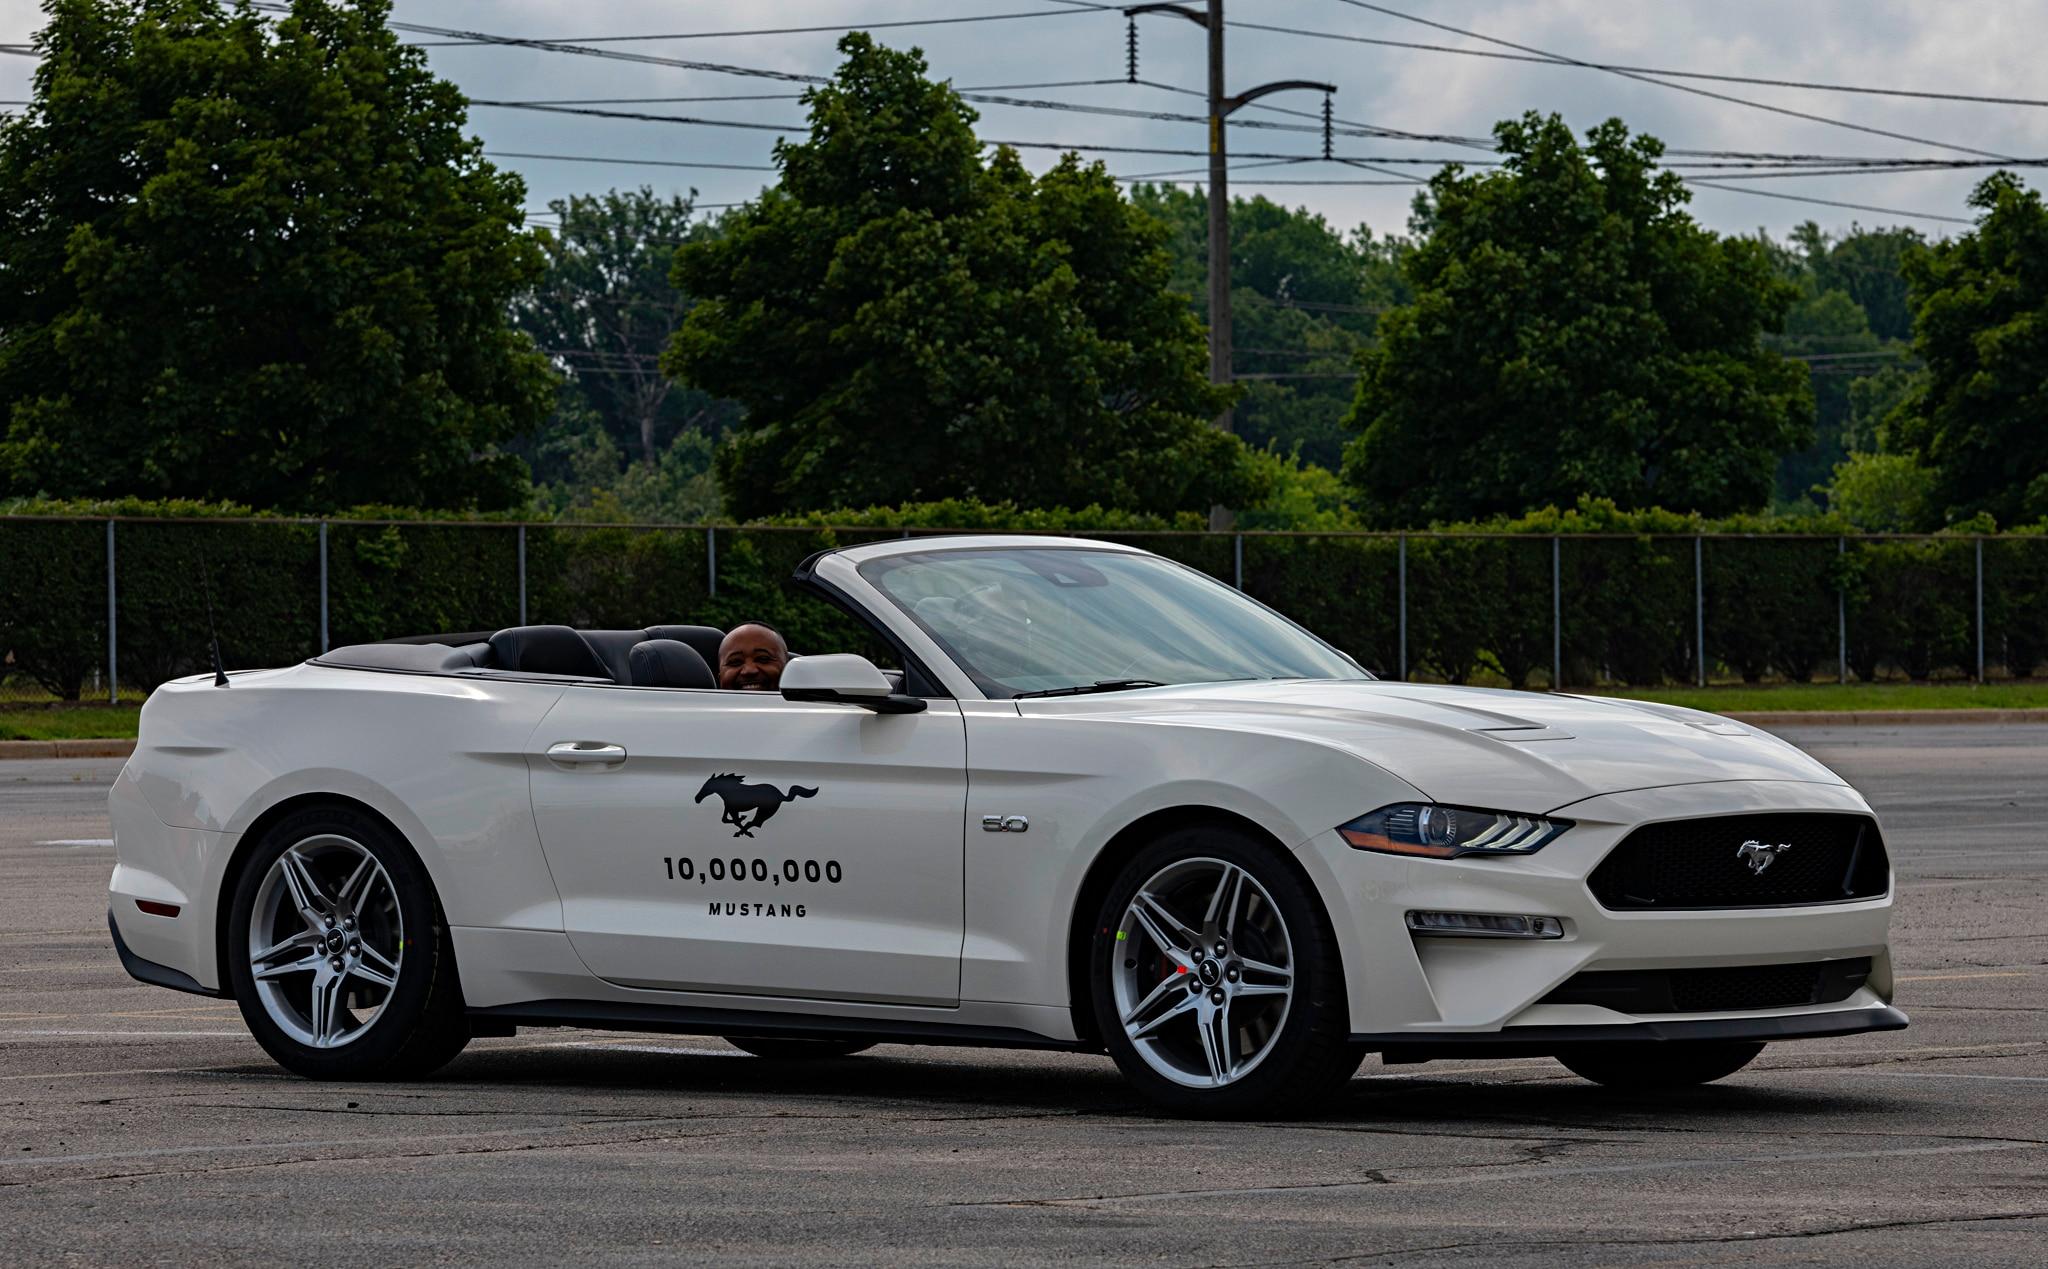 Mustang Ten Millionth 037